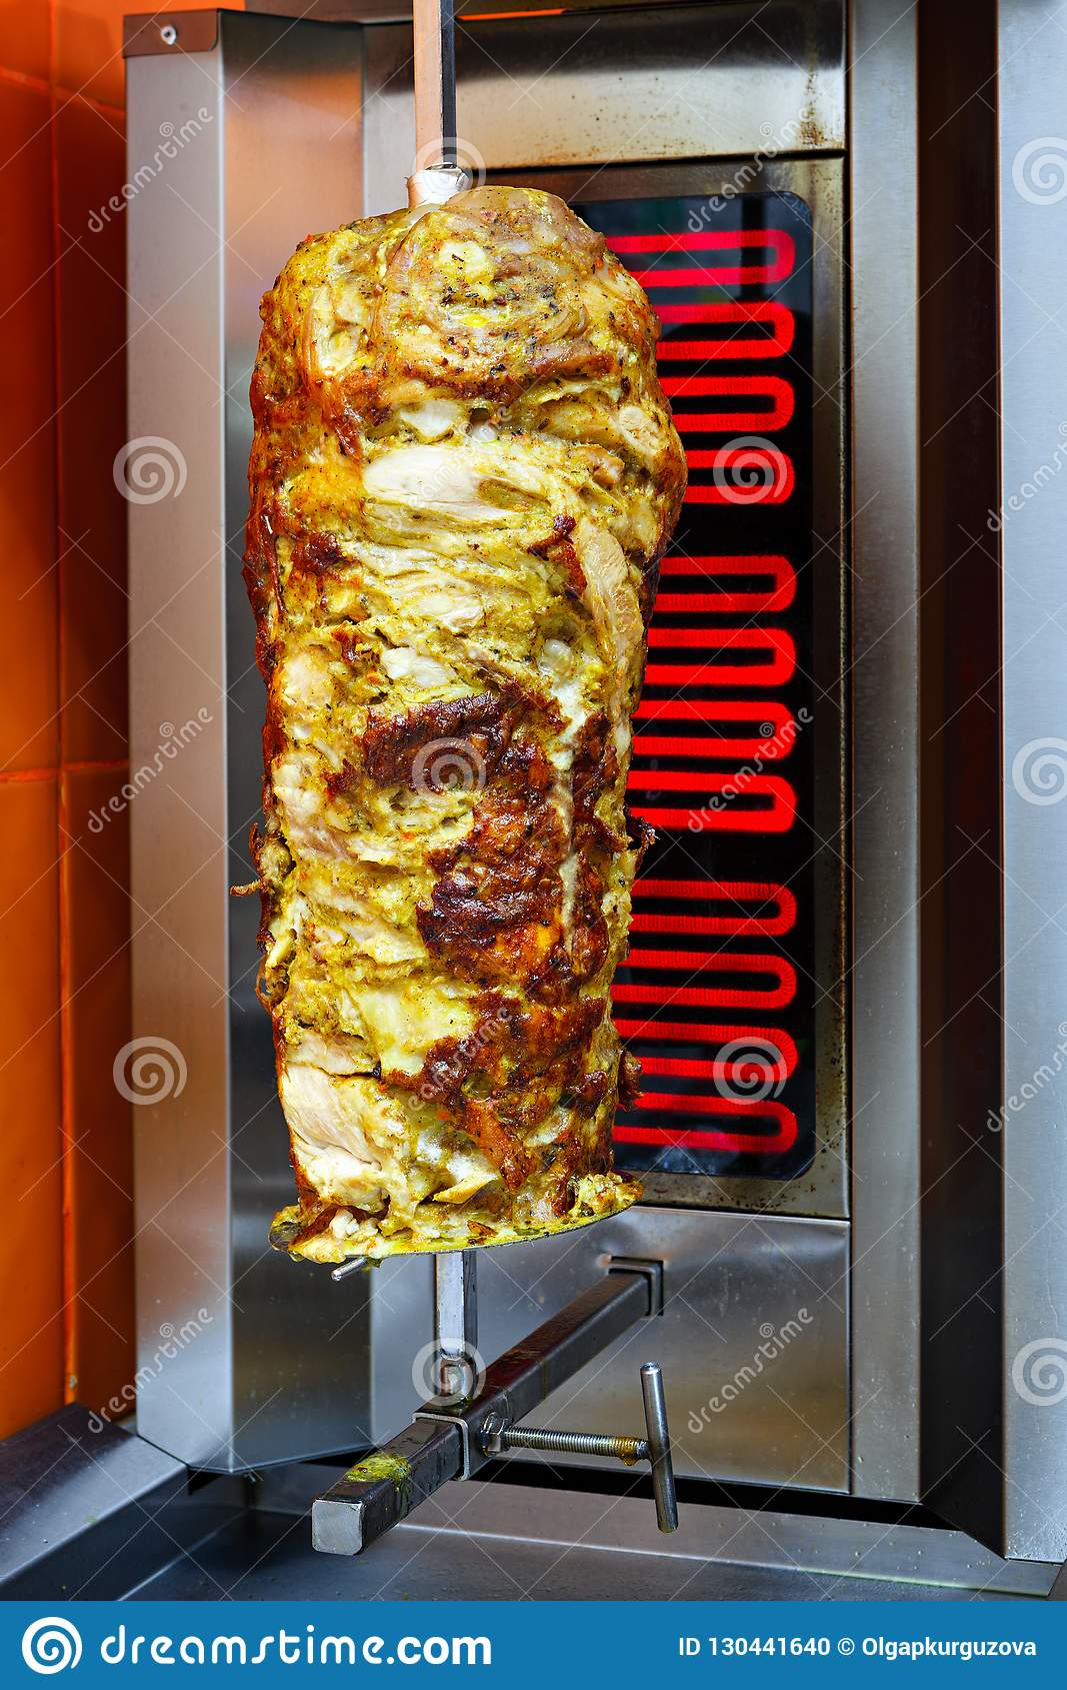 Cuisson de la viande pour le shawarma